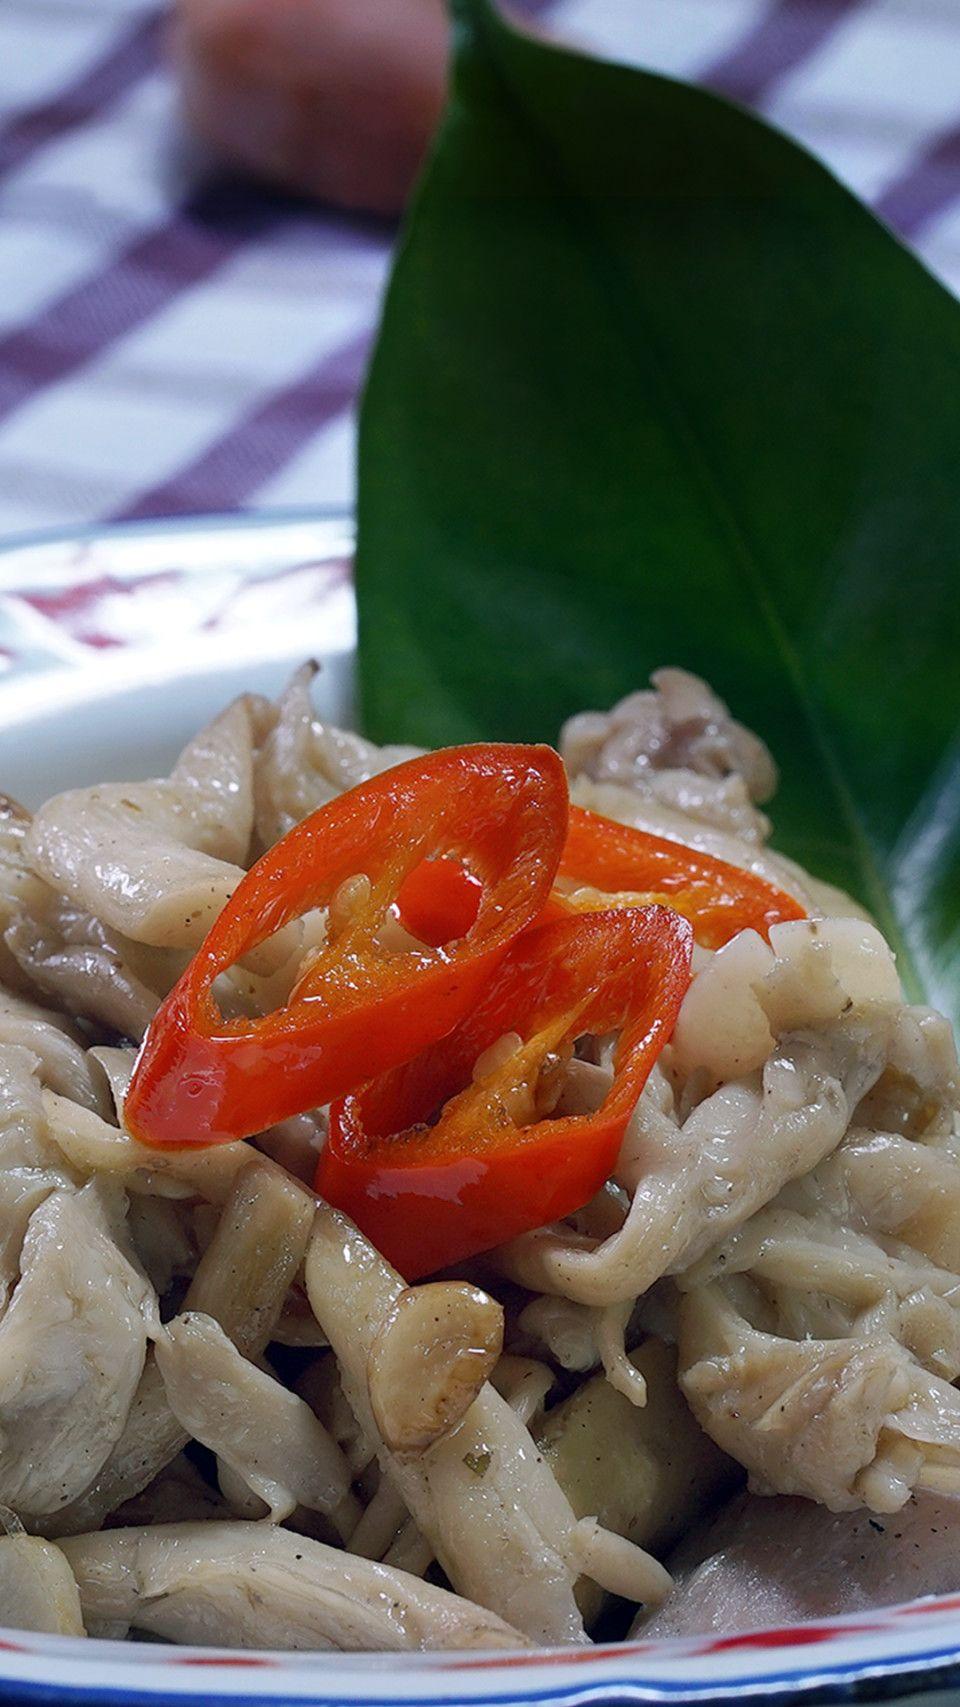 Resep Tumis Bakso Jamur Kancing Oleh Lizna Ananda Resep Jamur Kancing Resep Resep Masakan Indonesia